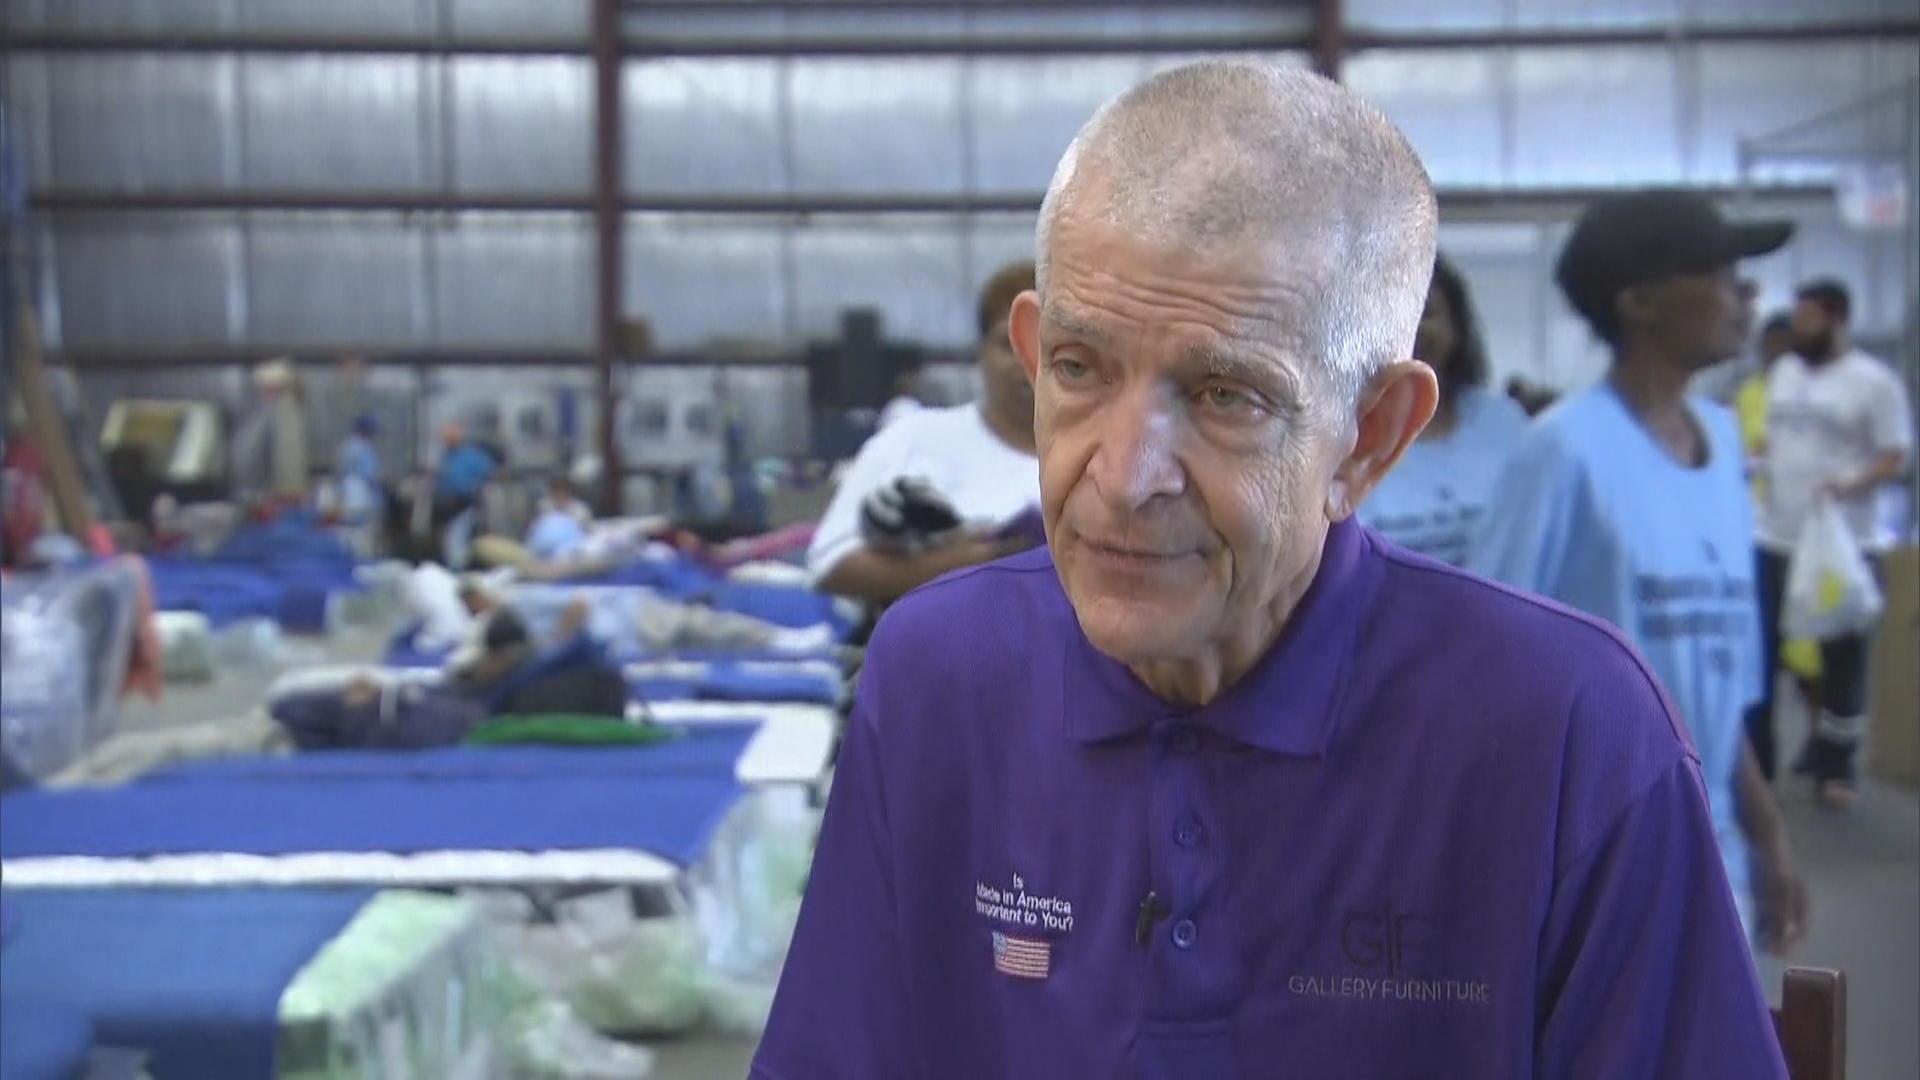 Mattress Mack Houston Furniture Store Owner Offers Refuge